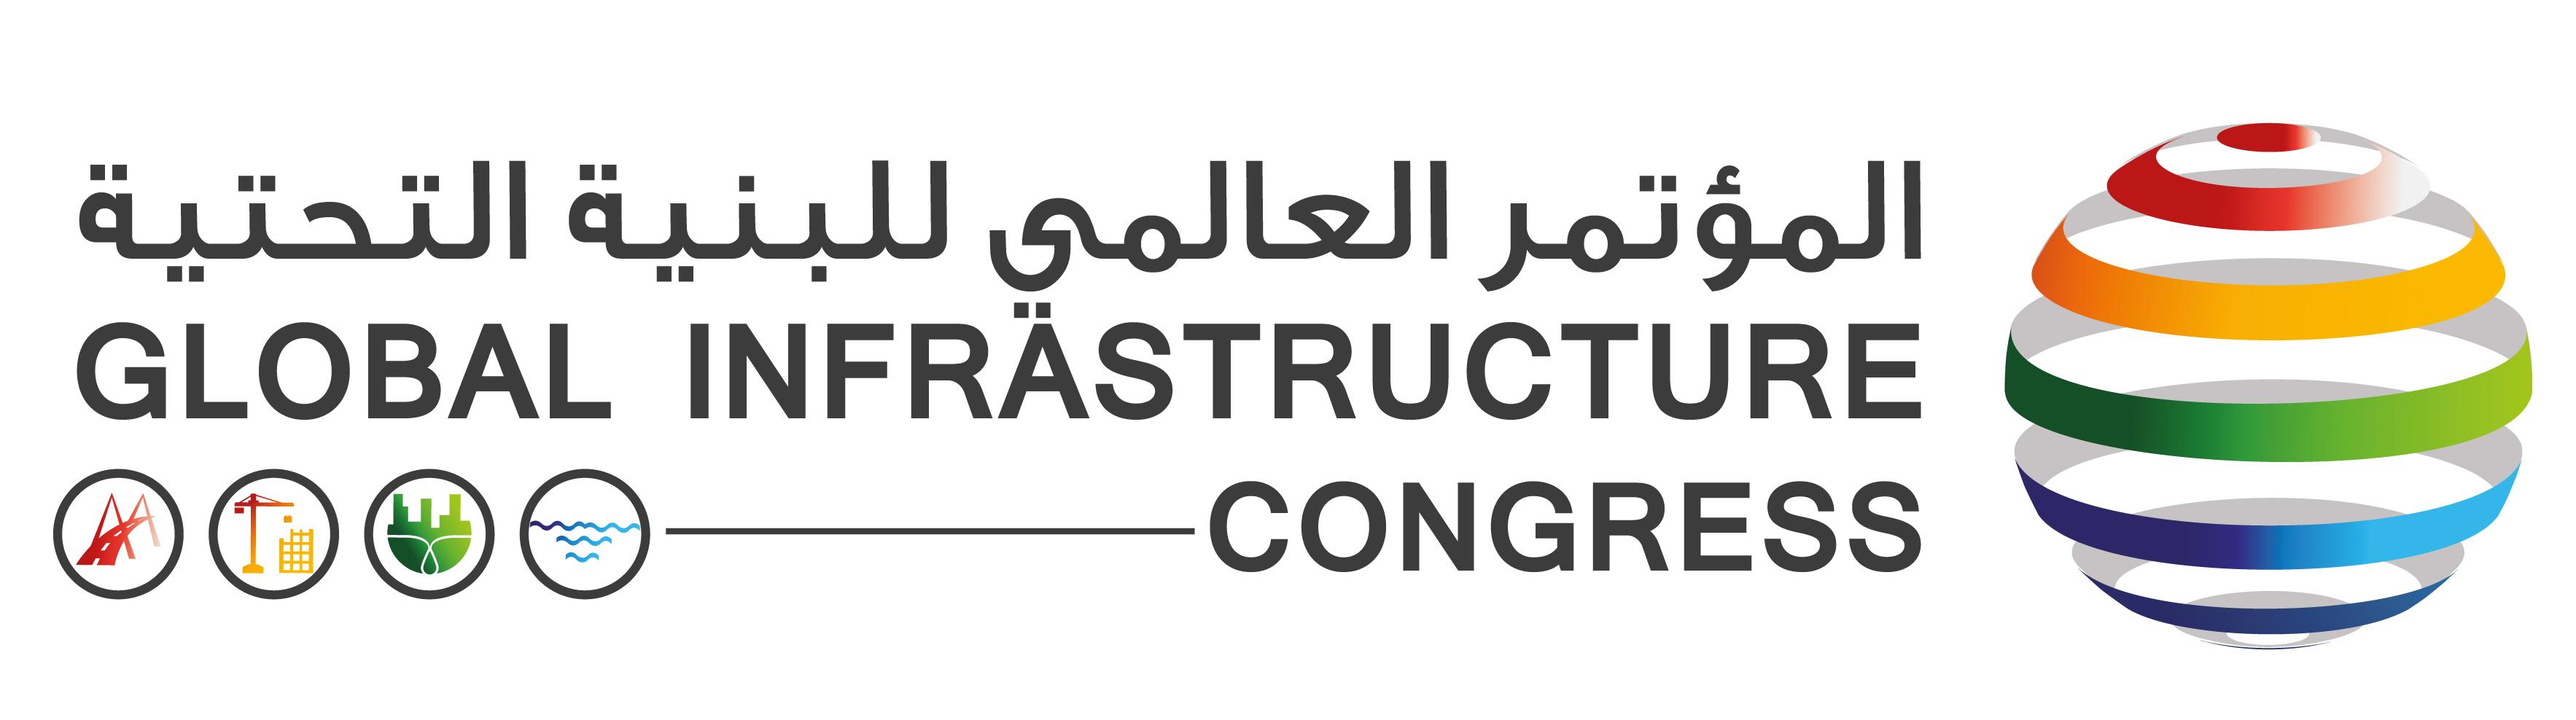 Global Infrastructure Congress 2018